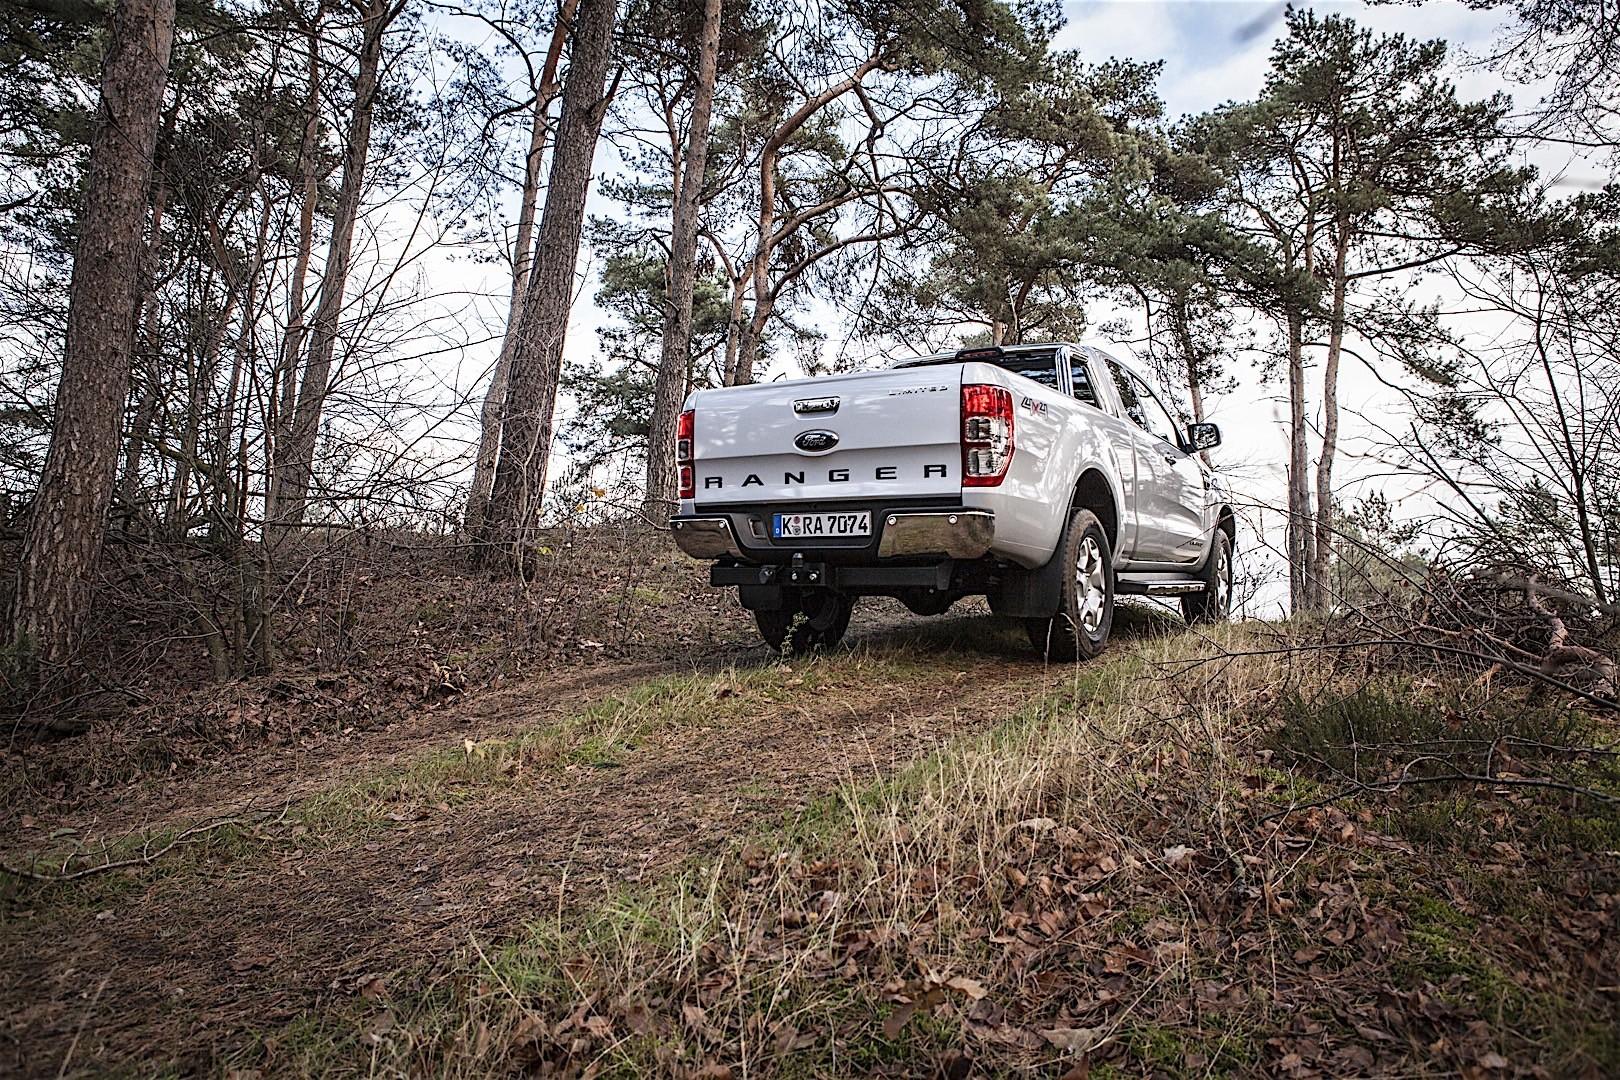 ford ranger super cab specs  u0026 photos - 2015  2016  2017  2018  2019  2020